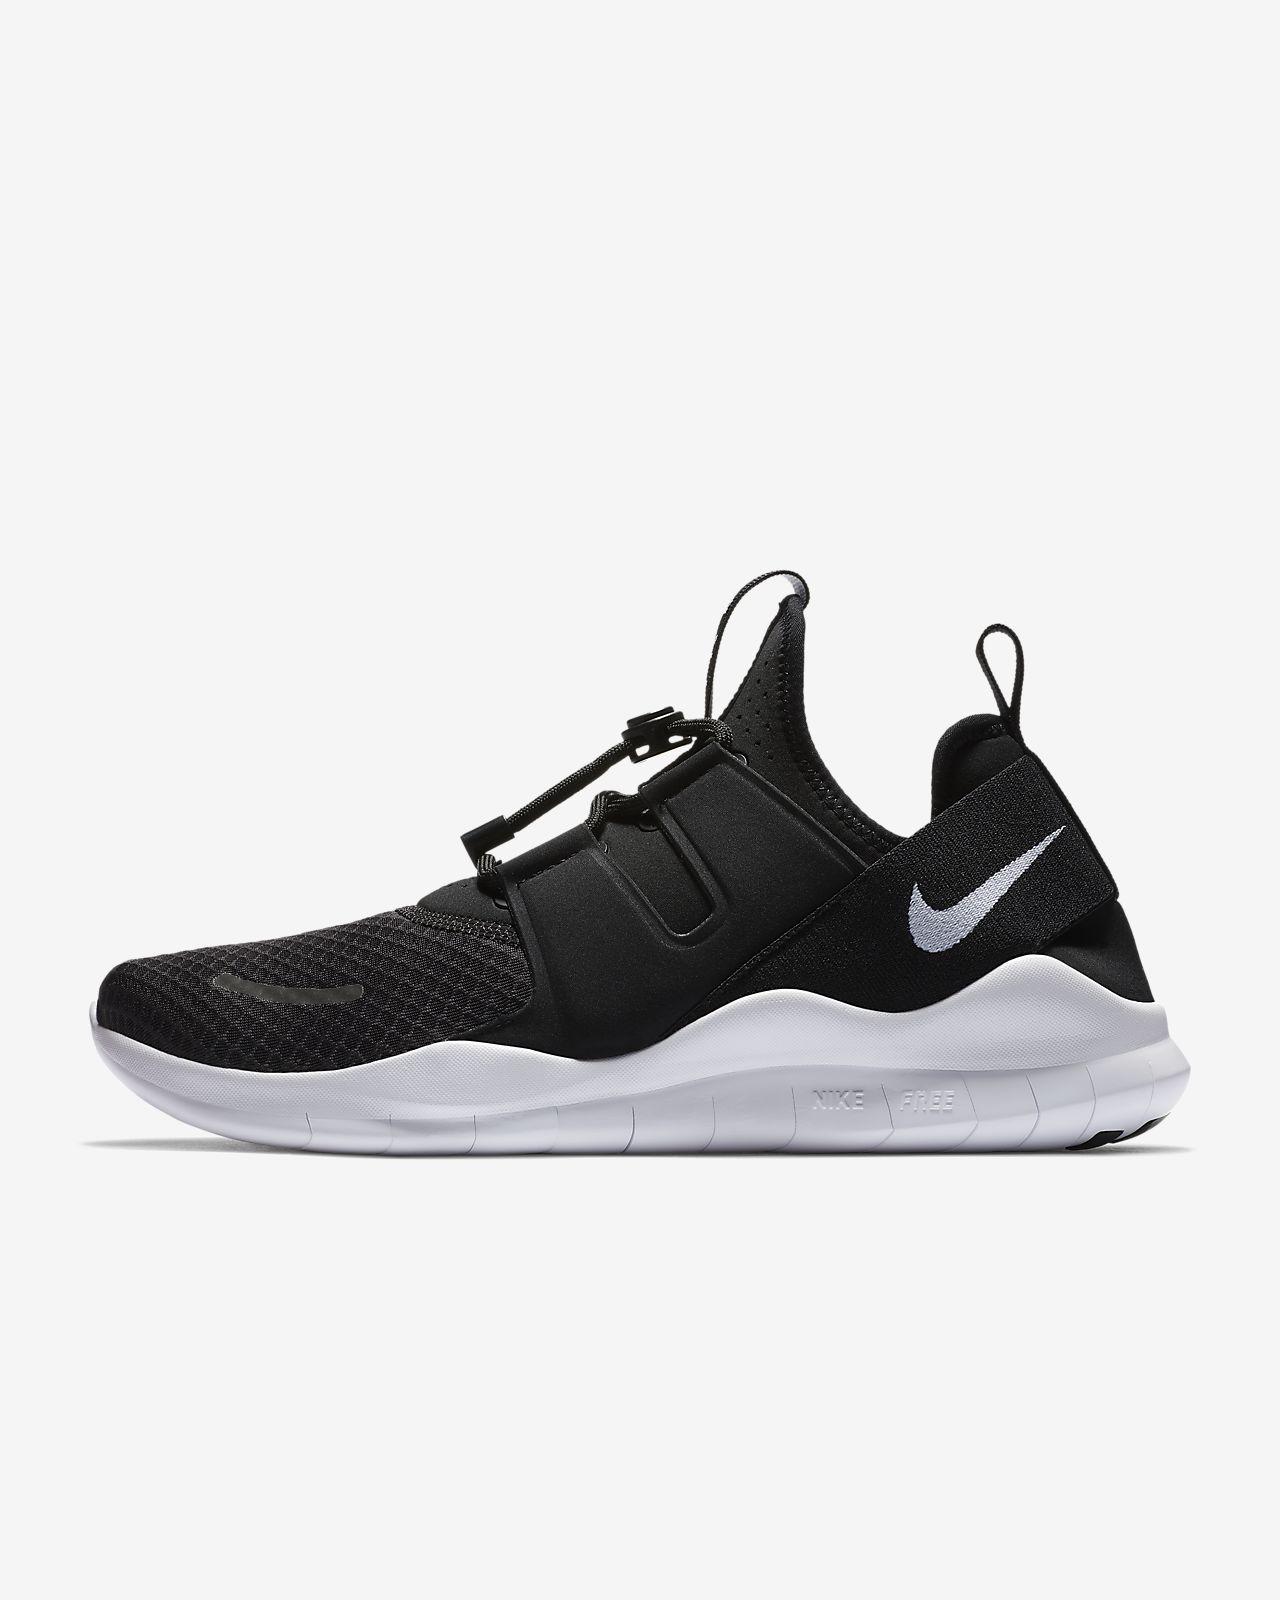 Nike Flex Sole Sneakers Shoes  6032108a0